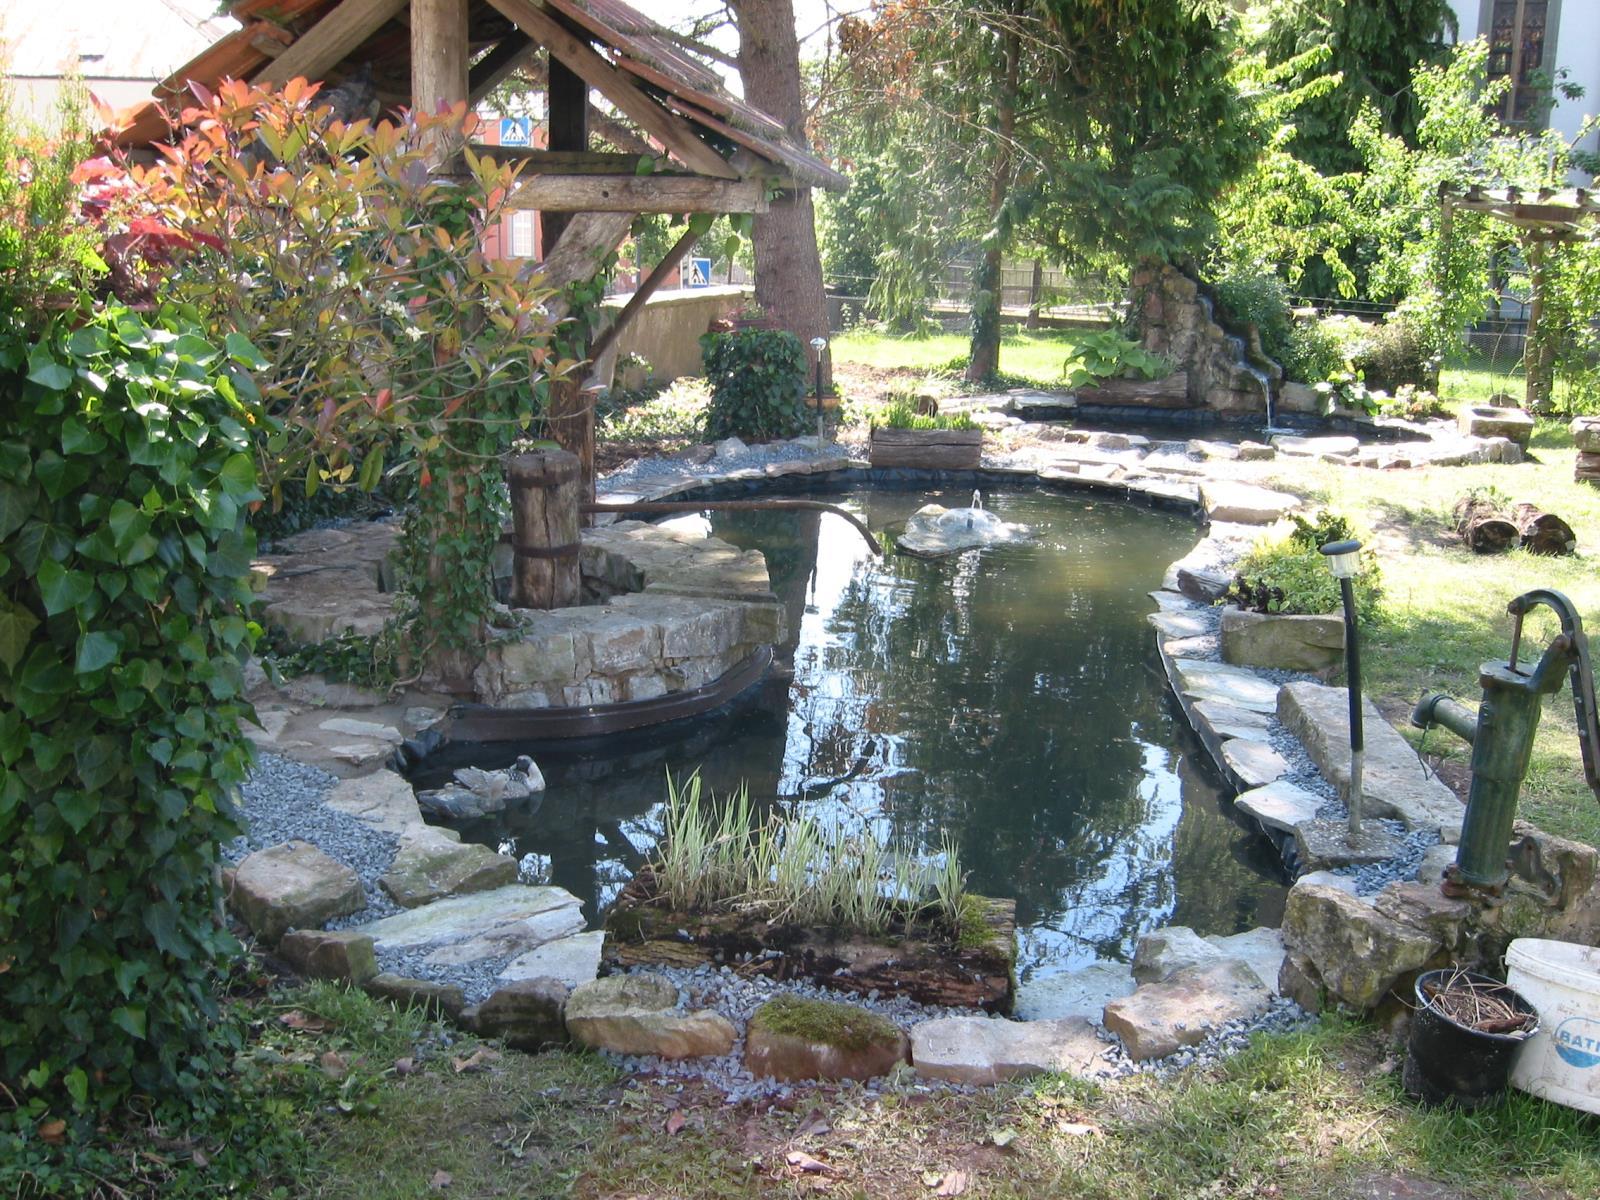 Jardin du soleil landschaftsplaner garten editus for Jardin soleil